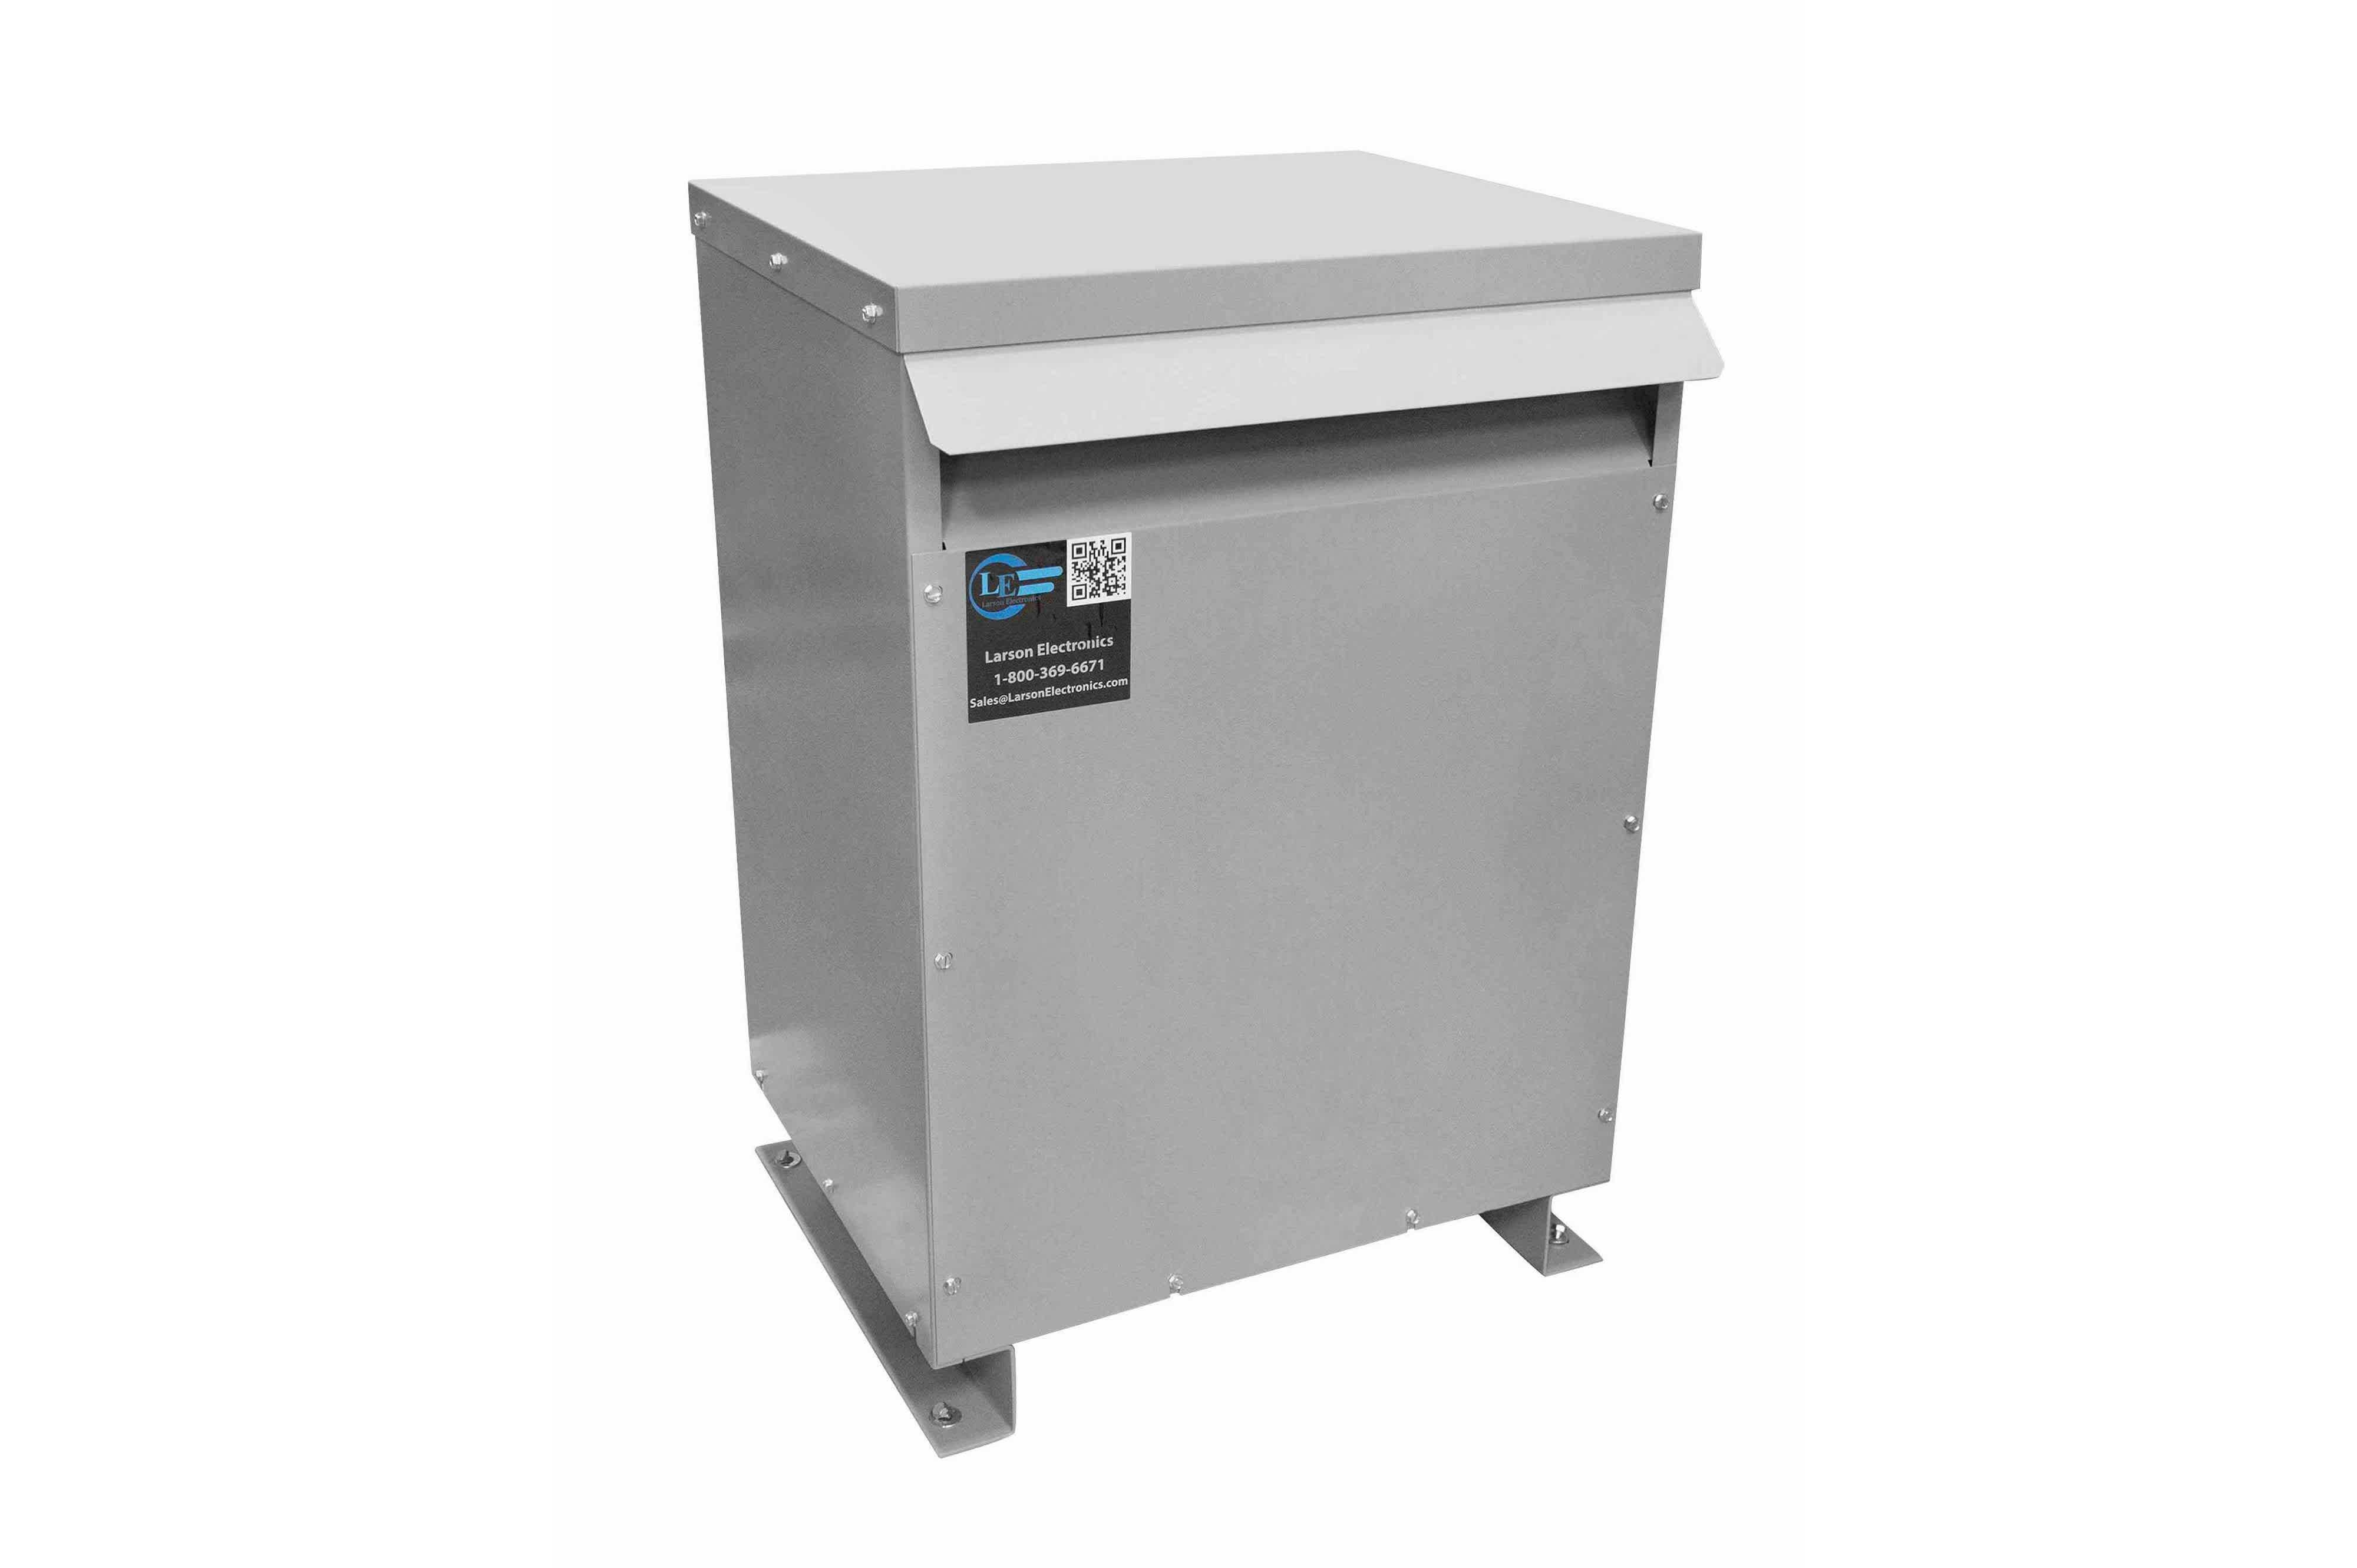 112.5 kVA 3PH Isolation Transformer, 600V Wye Primary, 380Y/220 Wye-N Secondary, N3R, Ventilated, 60 Hz